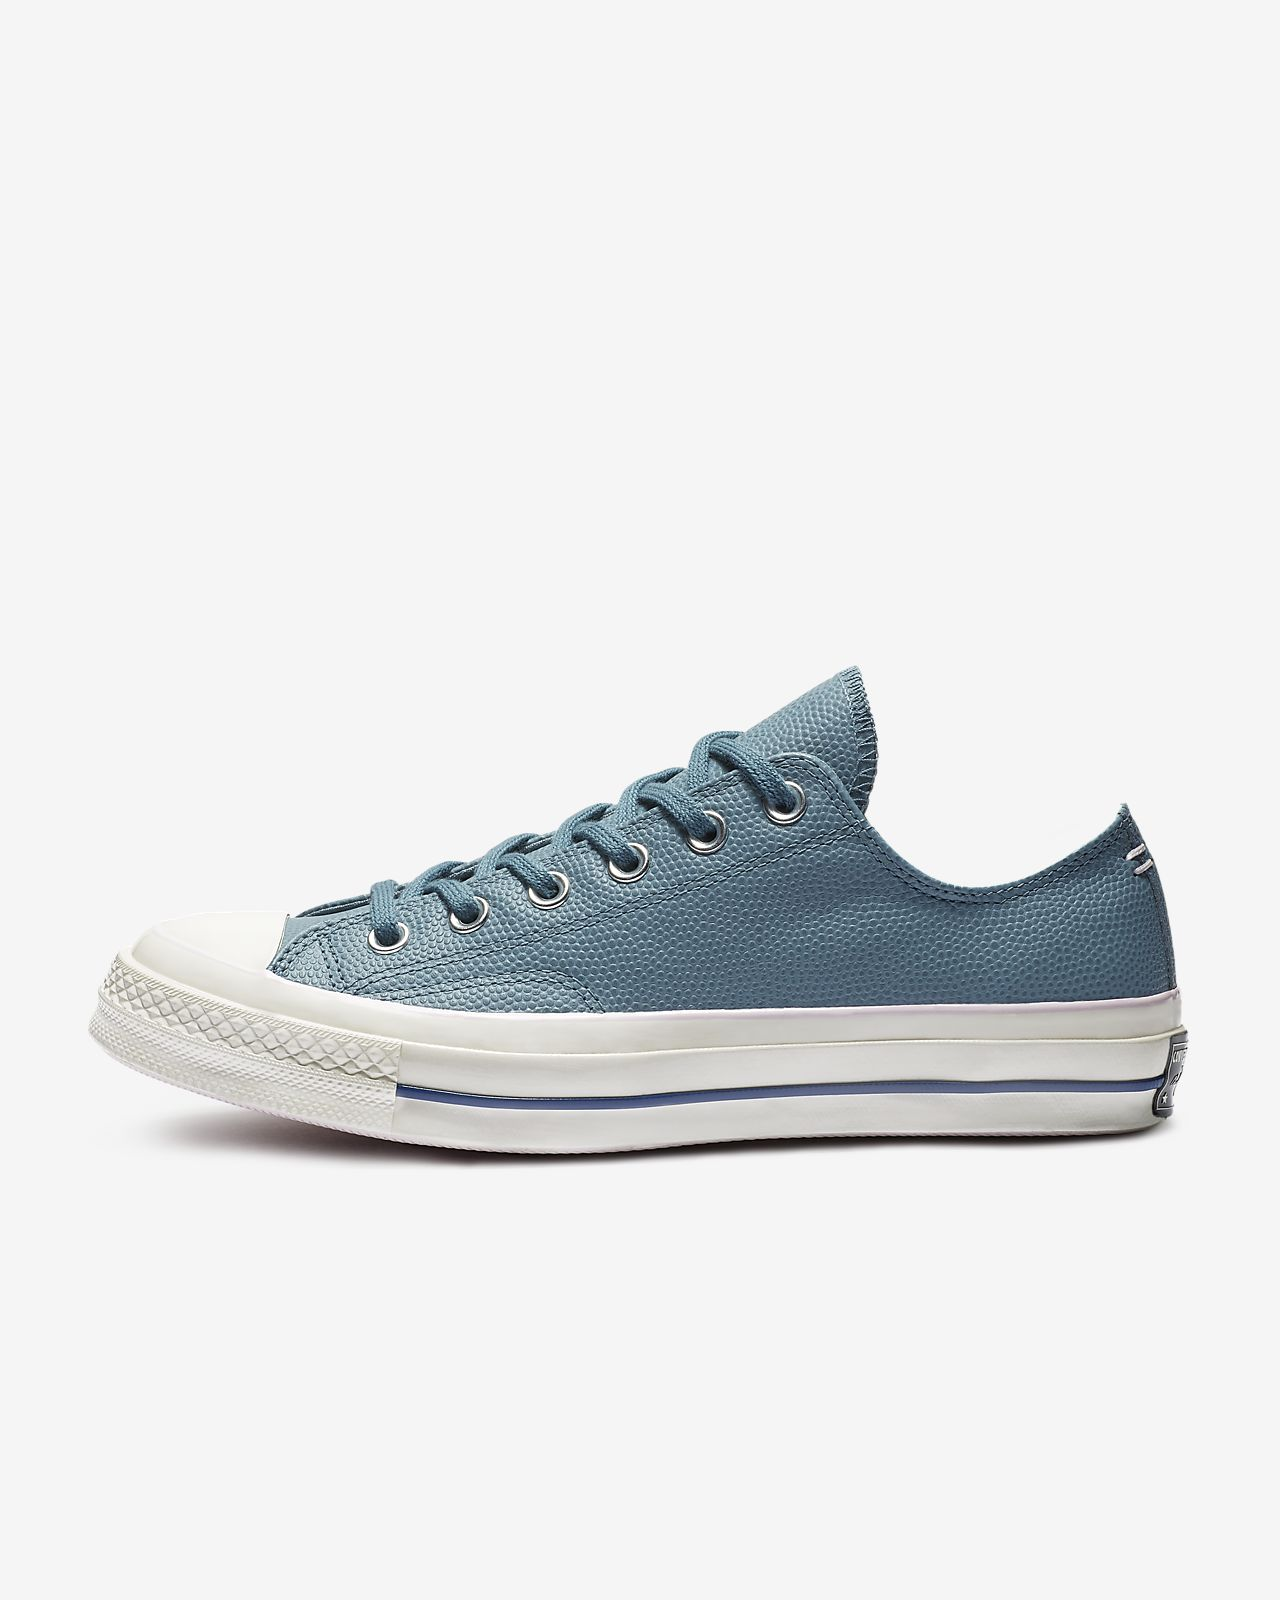 Chuck 70 Pastel Low Top Womens Shoe